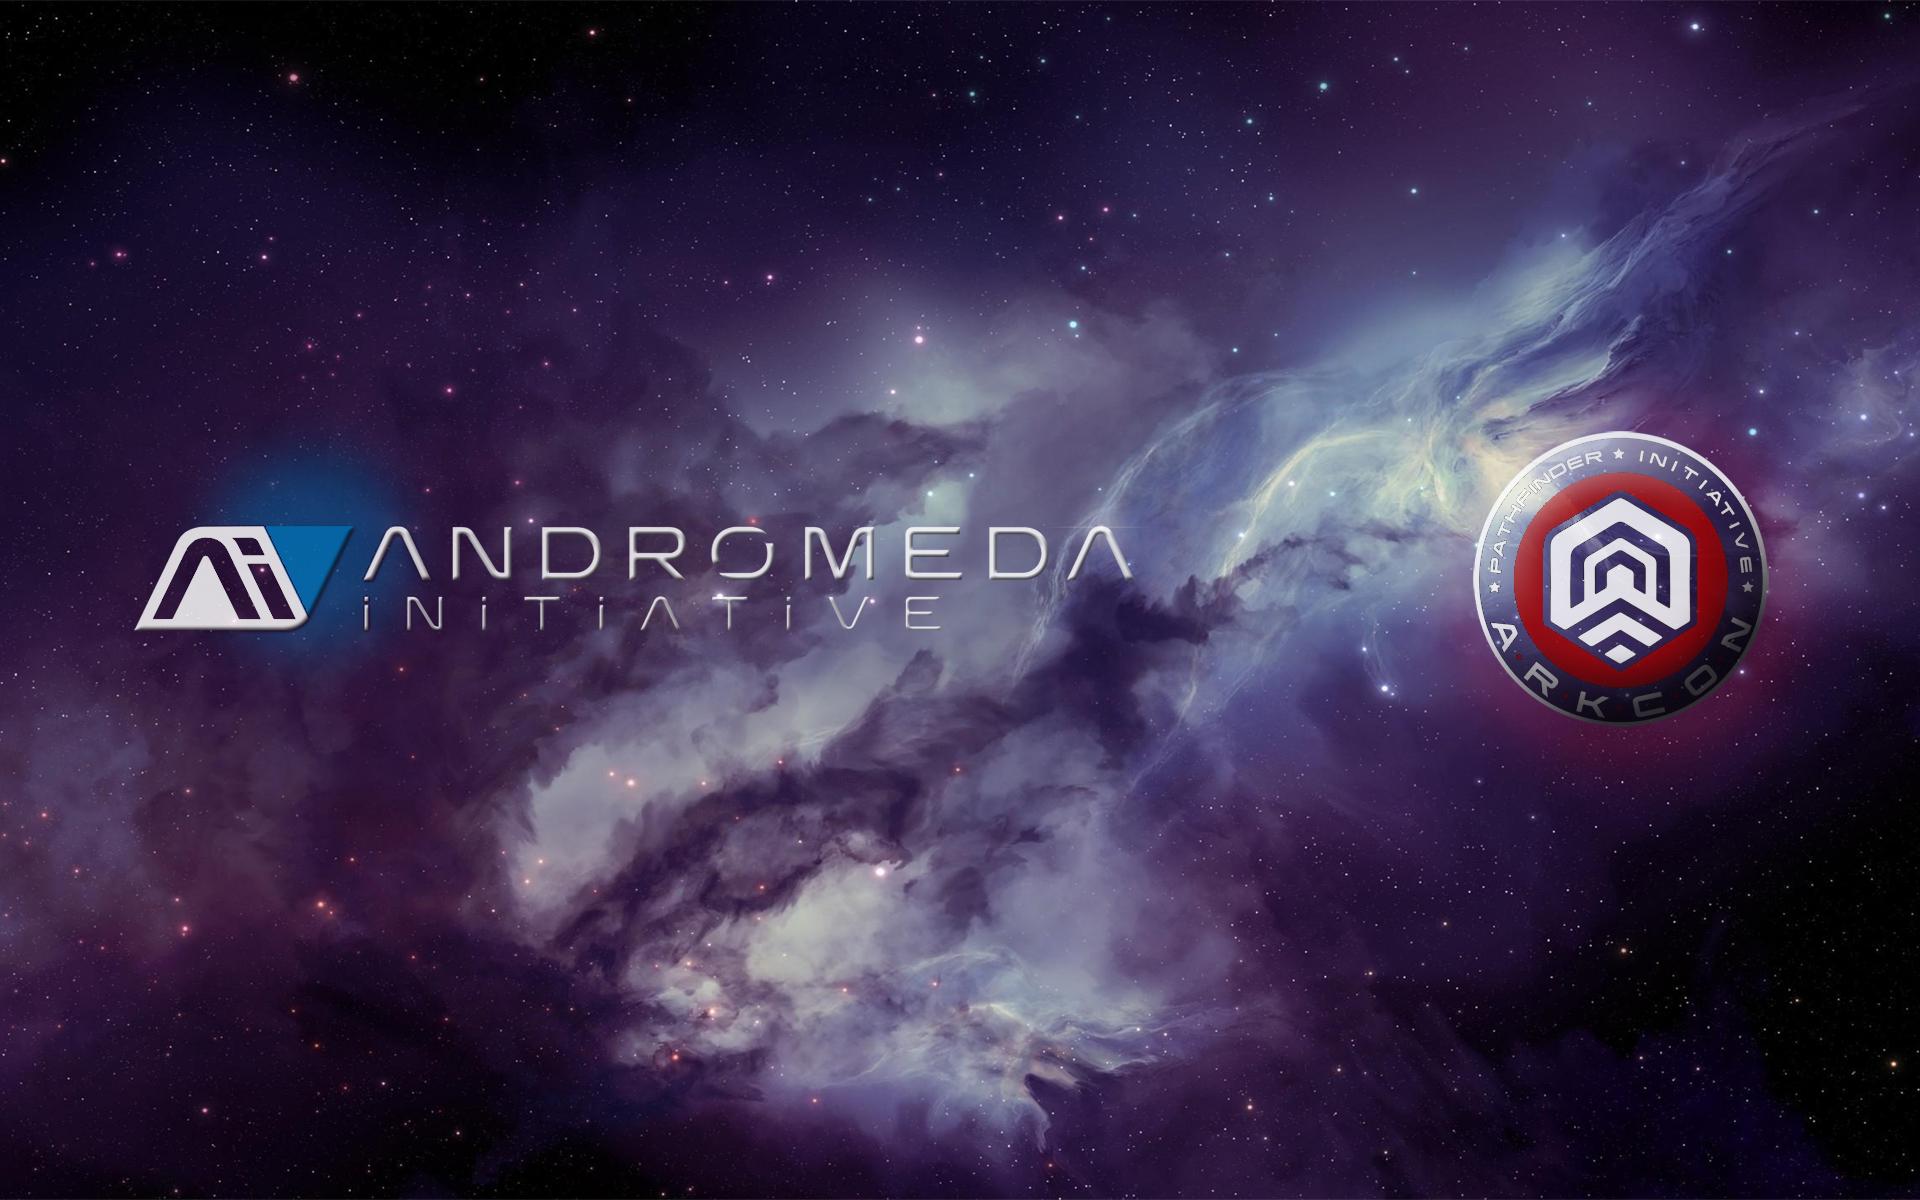 Mass Effect Andromeda Wallpaper Hd Picturez 1920x1200